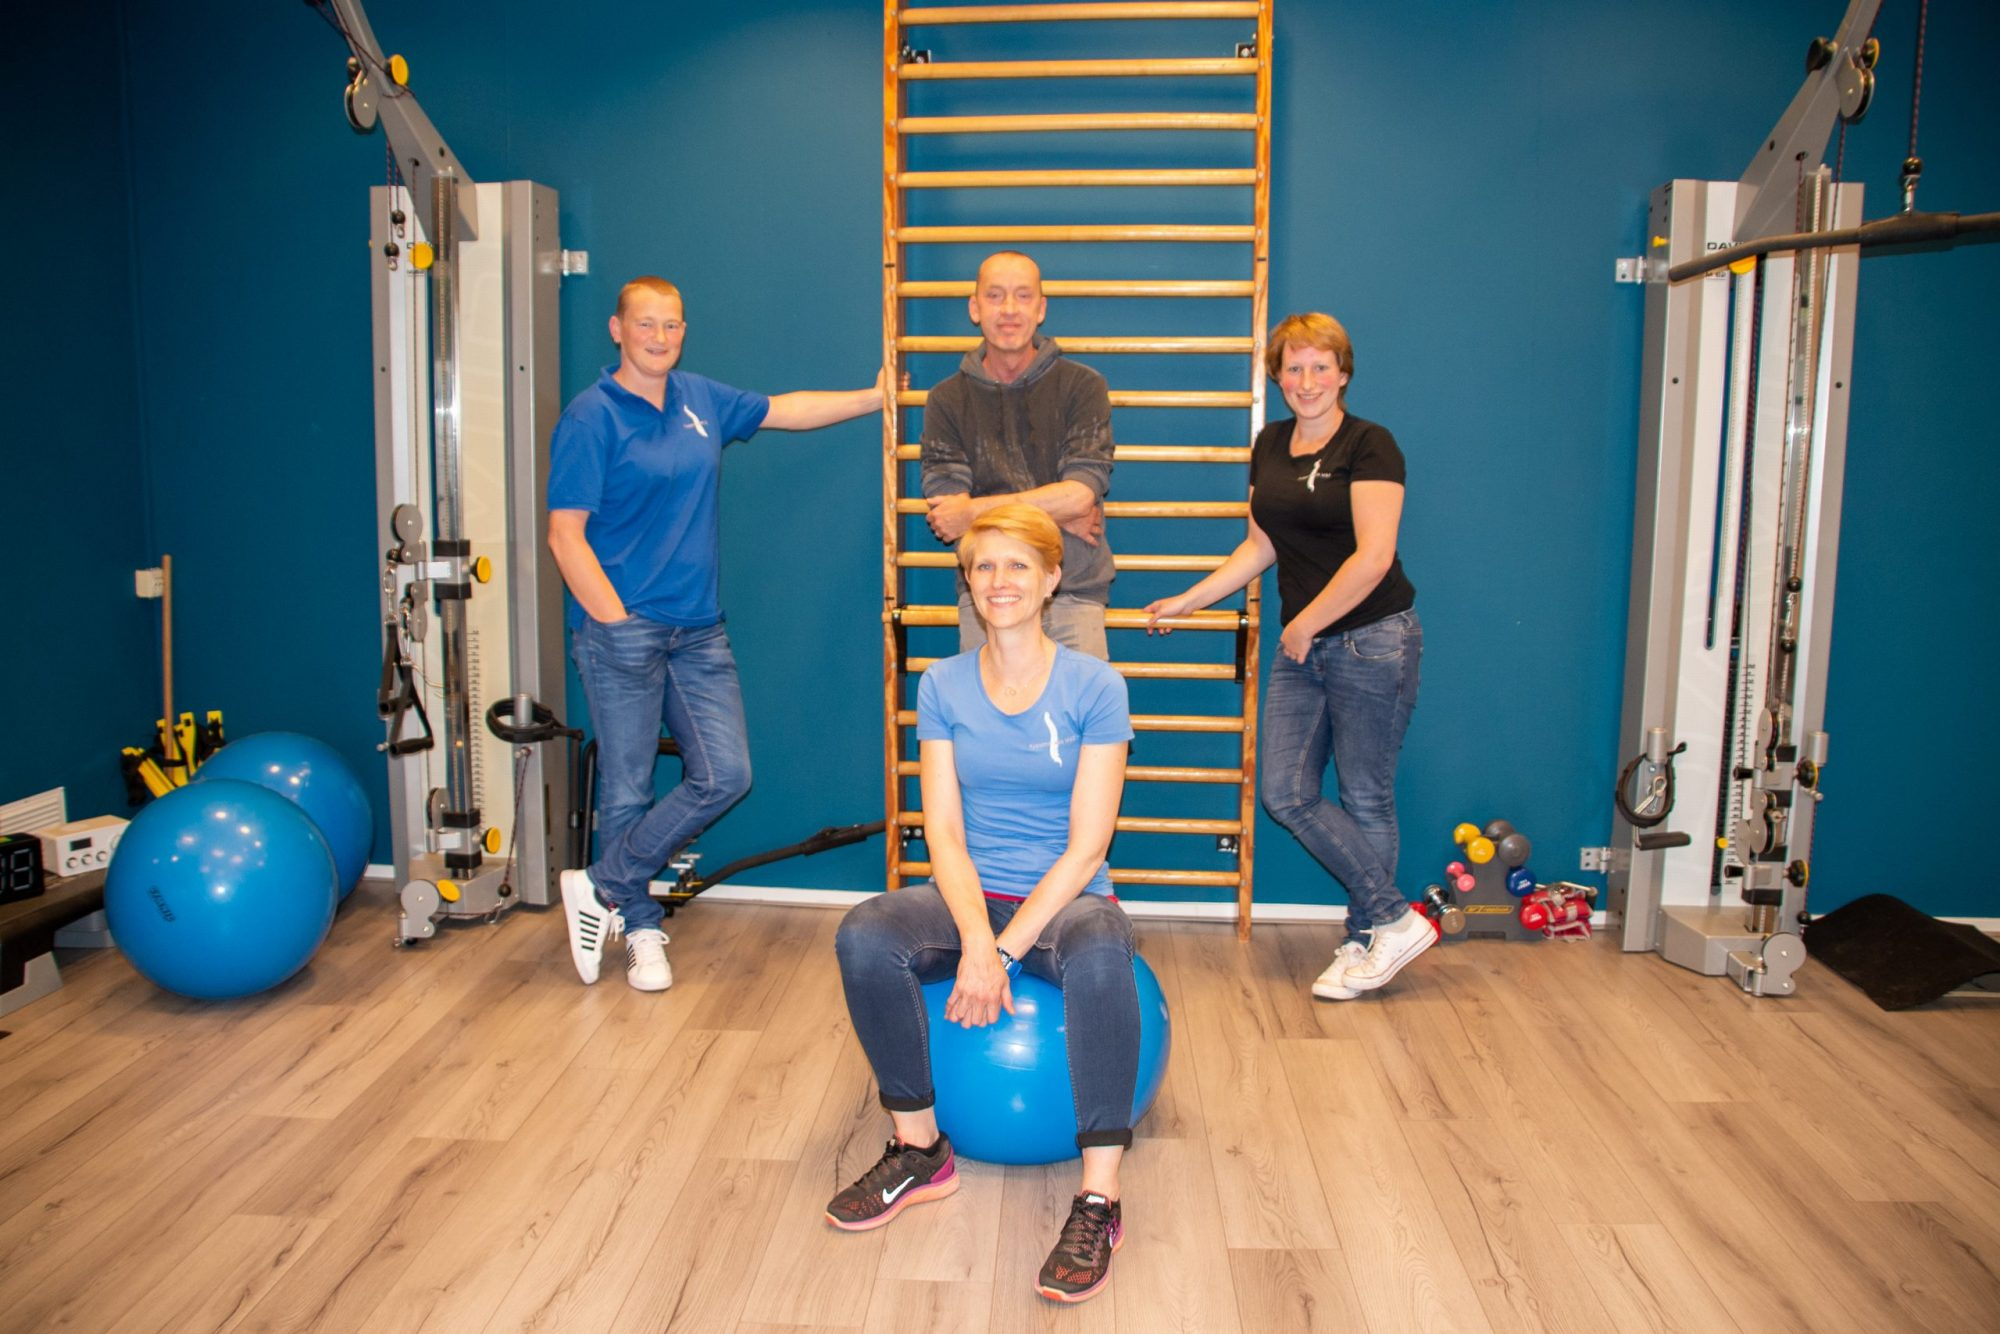 Welkom bij Fysiotherapie W&H!